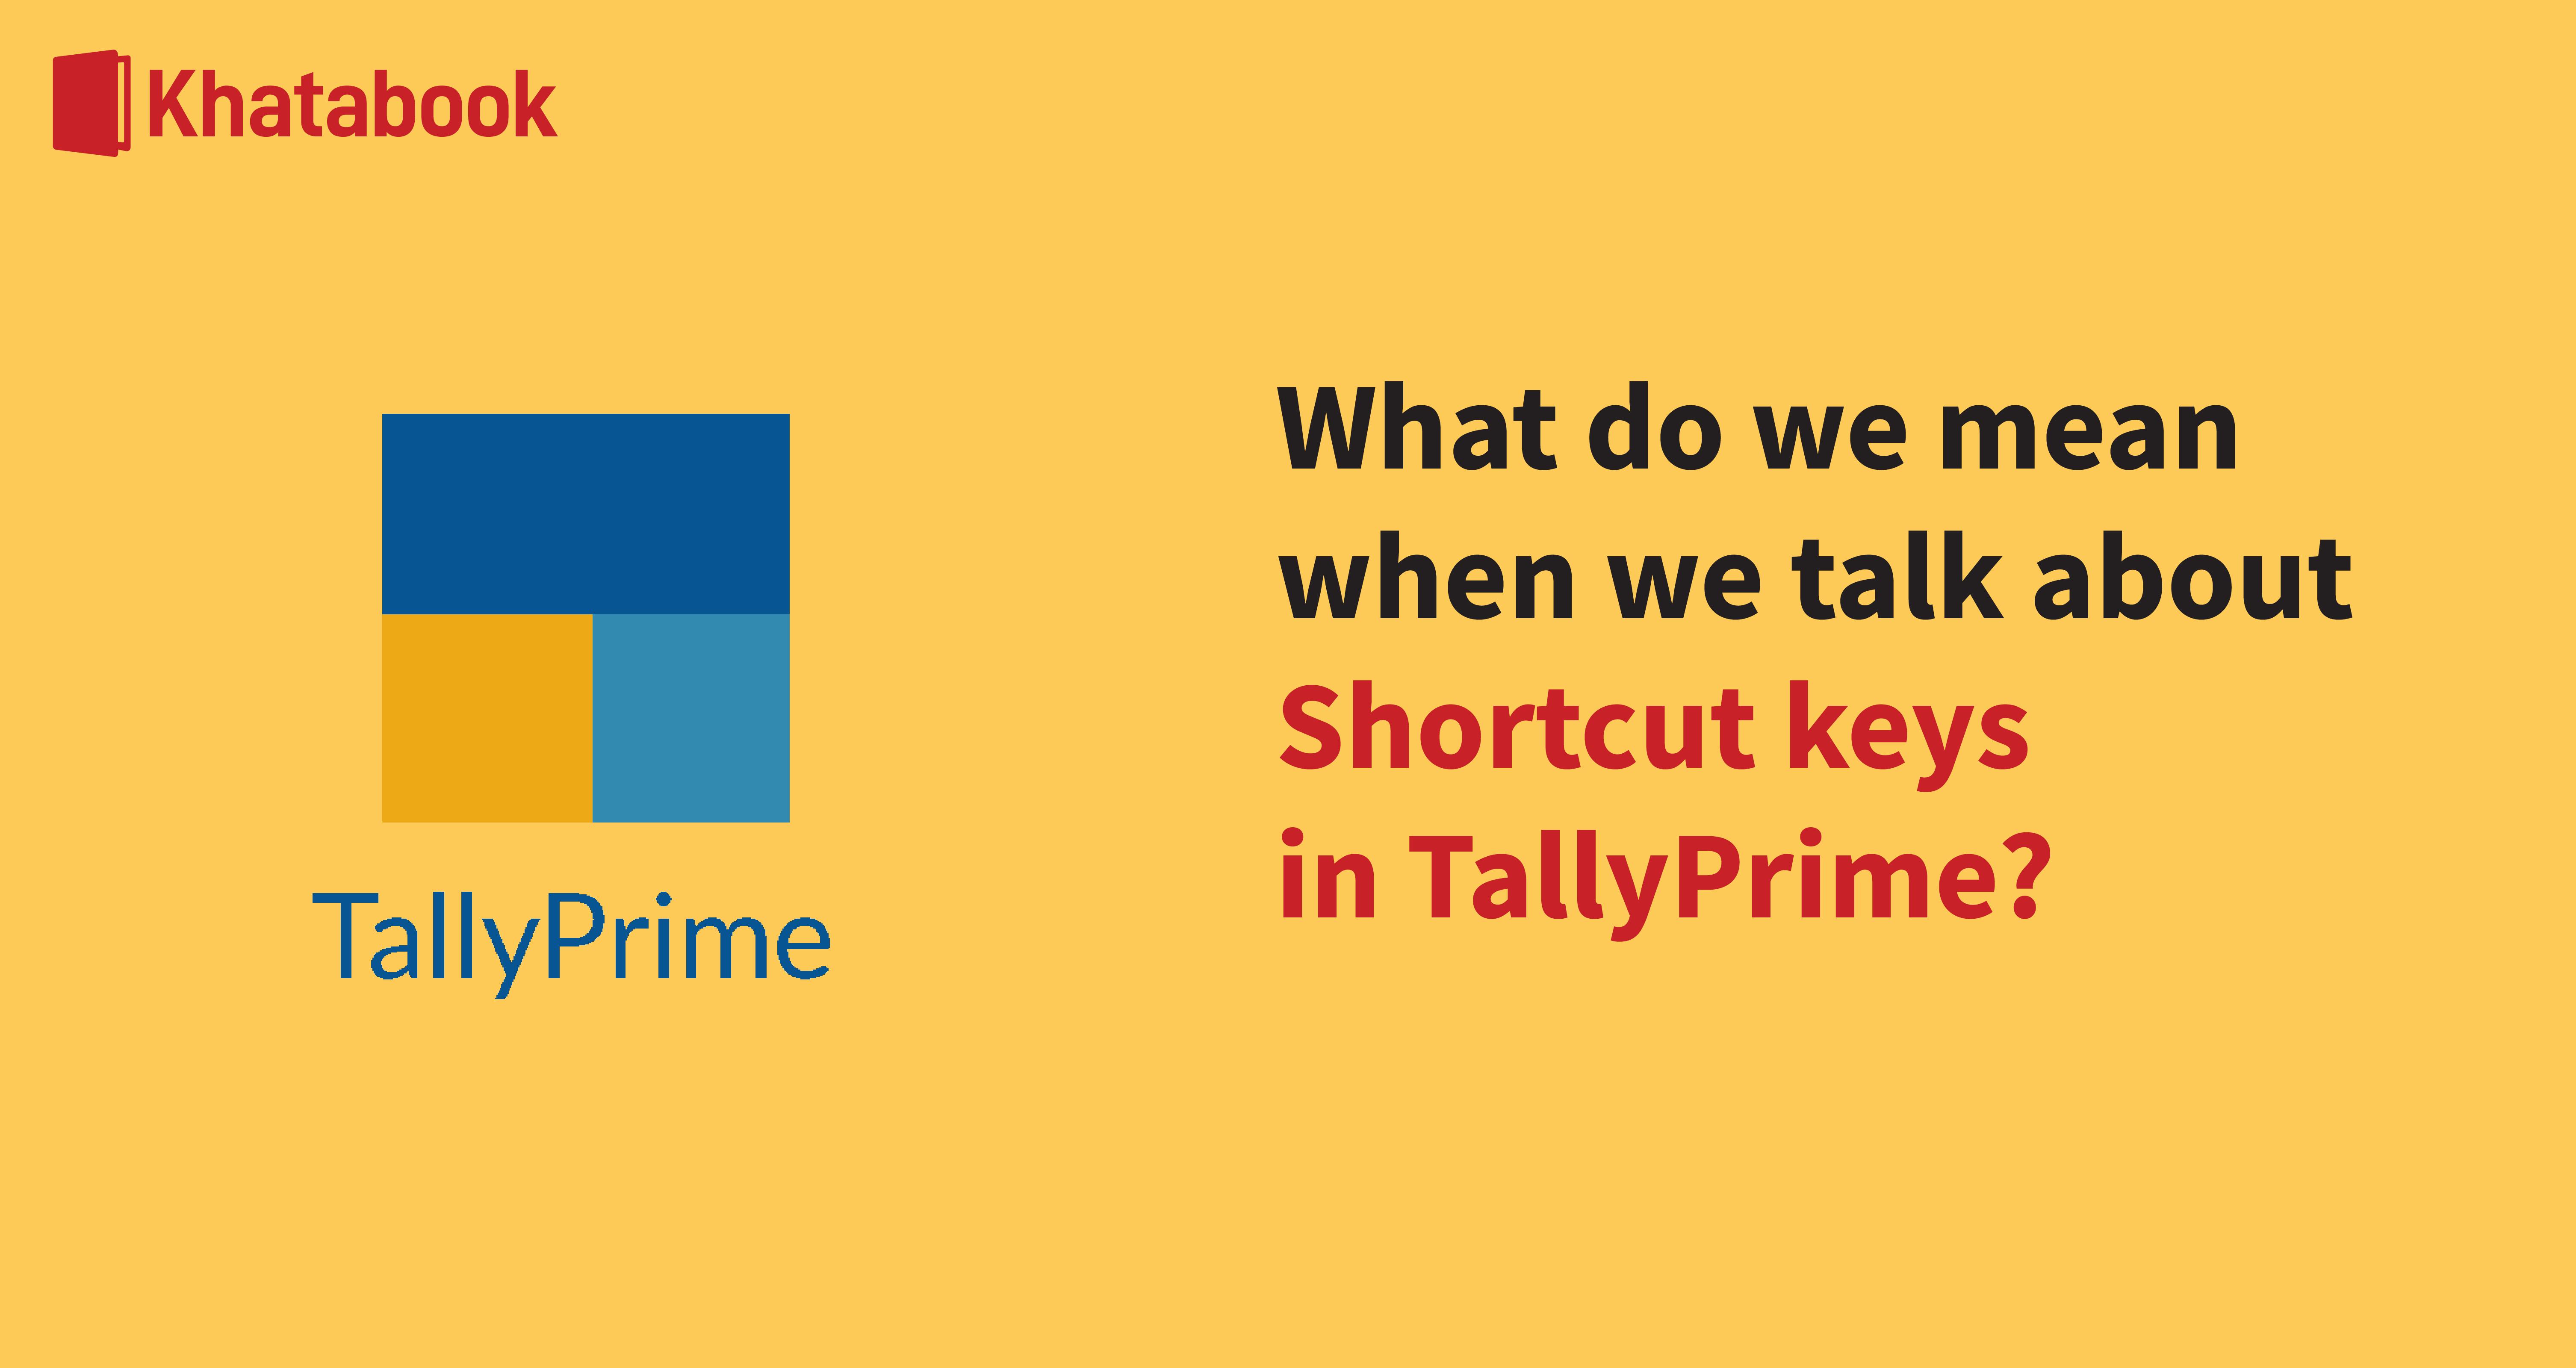 Shortcut Keys in Tally Prime